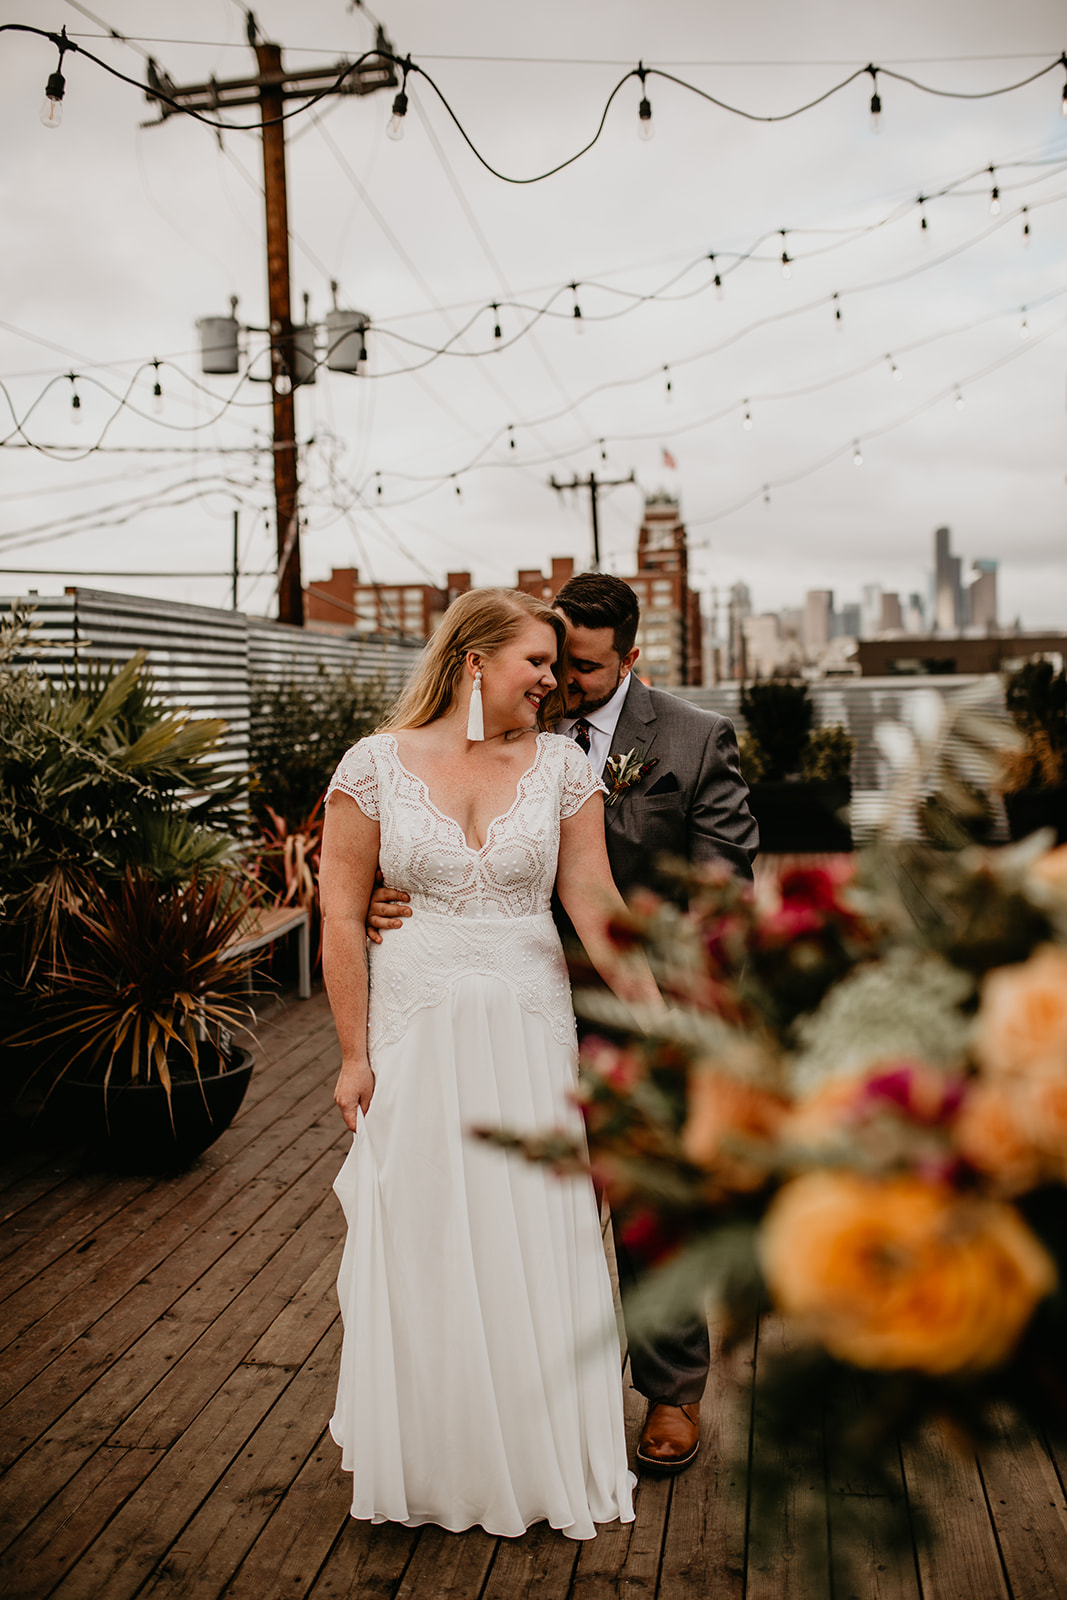 Gwen + Andrew February 2nd Wedding-134_websize.jpg